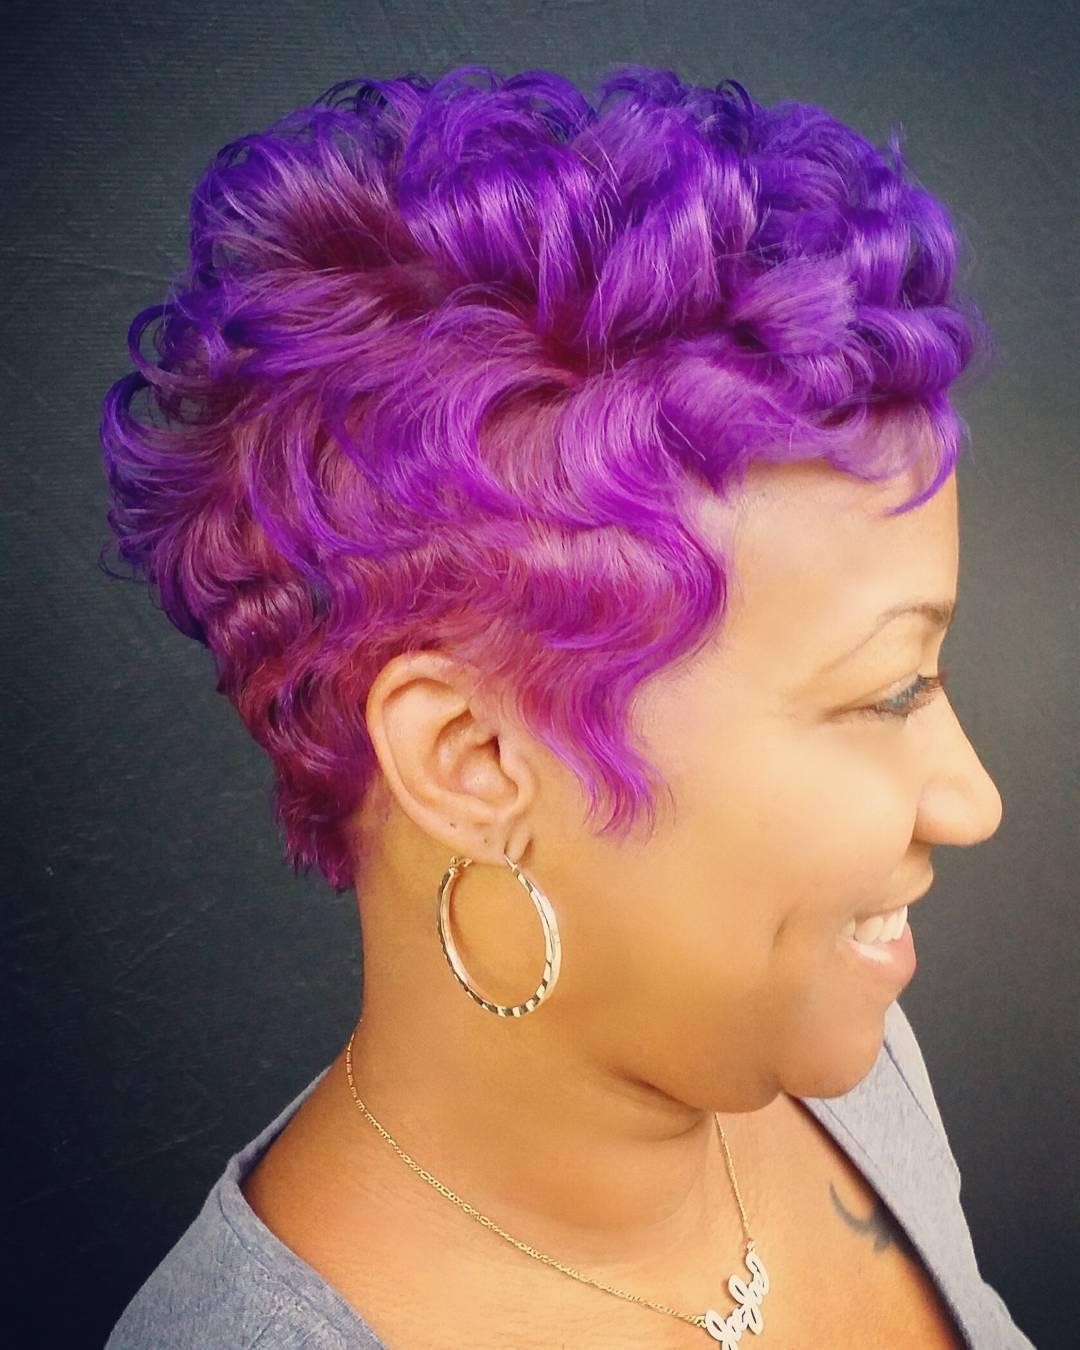 Purple Pixie Hairstyle